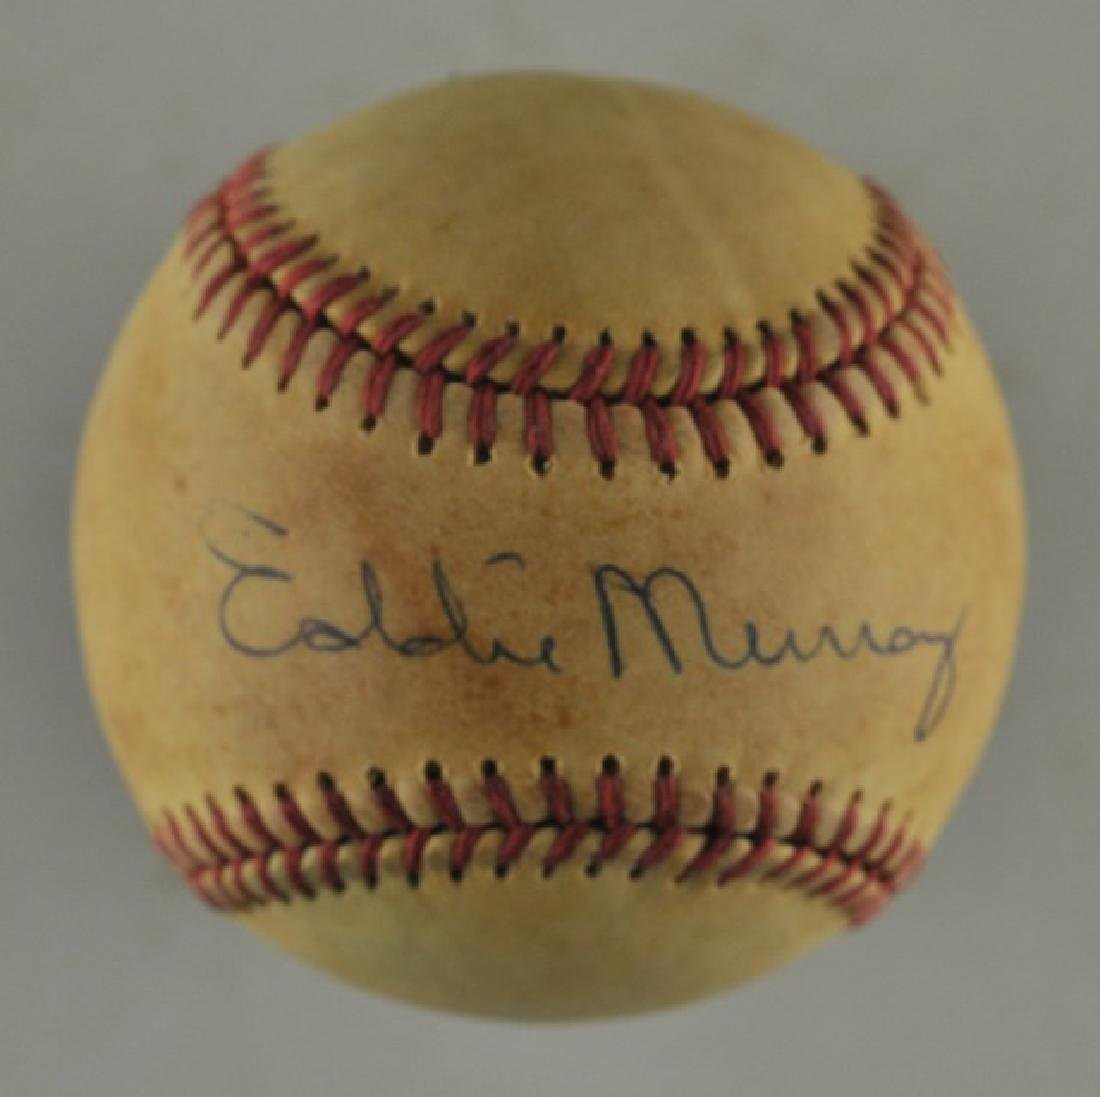 Signed Eddie Murray Baseball